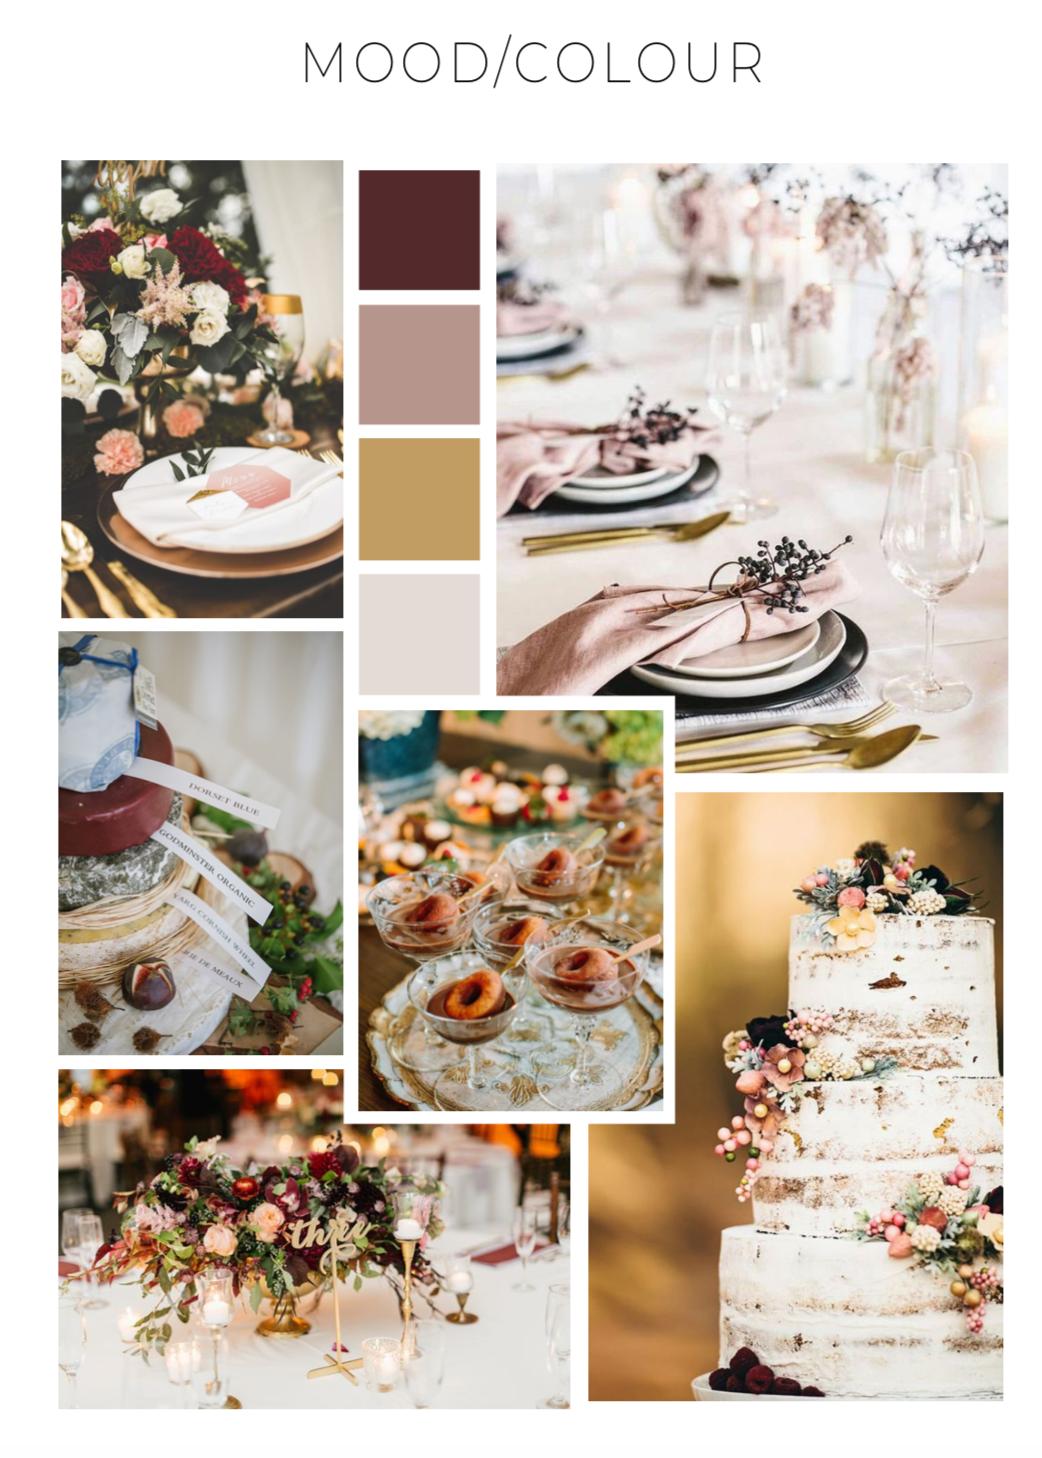 rustic-wedding-inspiration-mood-board.png